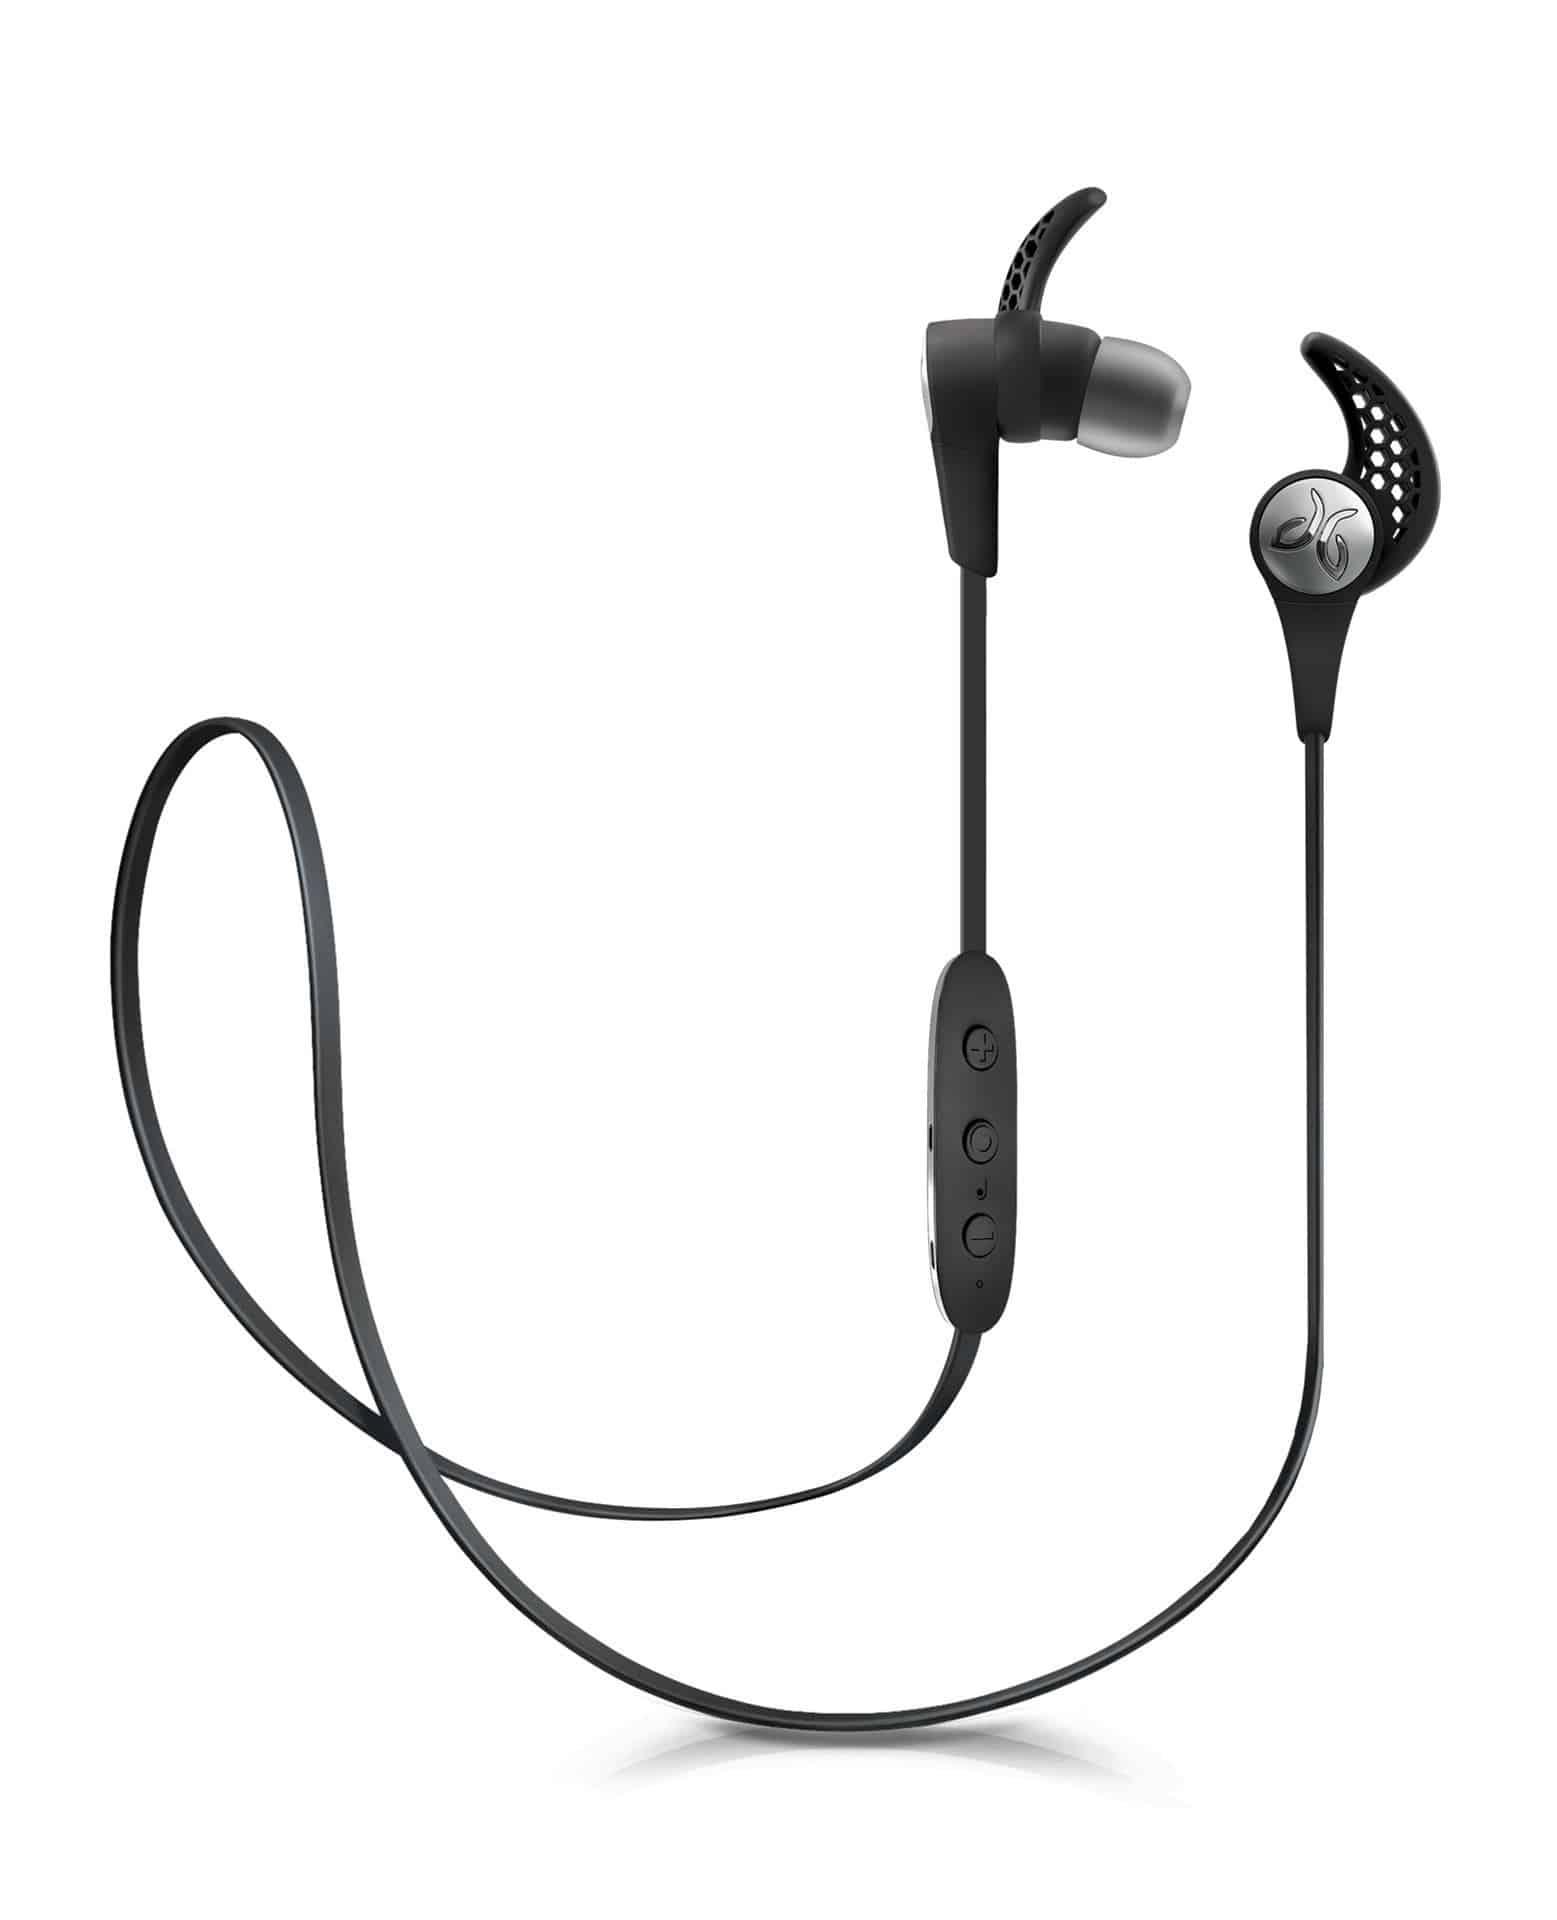 0002586_jaybird-x3-wireless-bluetooth-headphones.jpeg